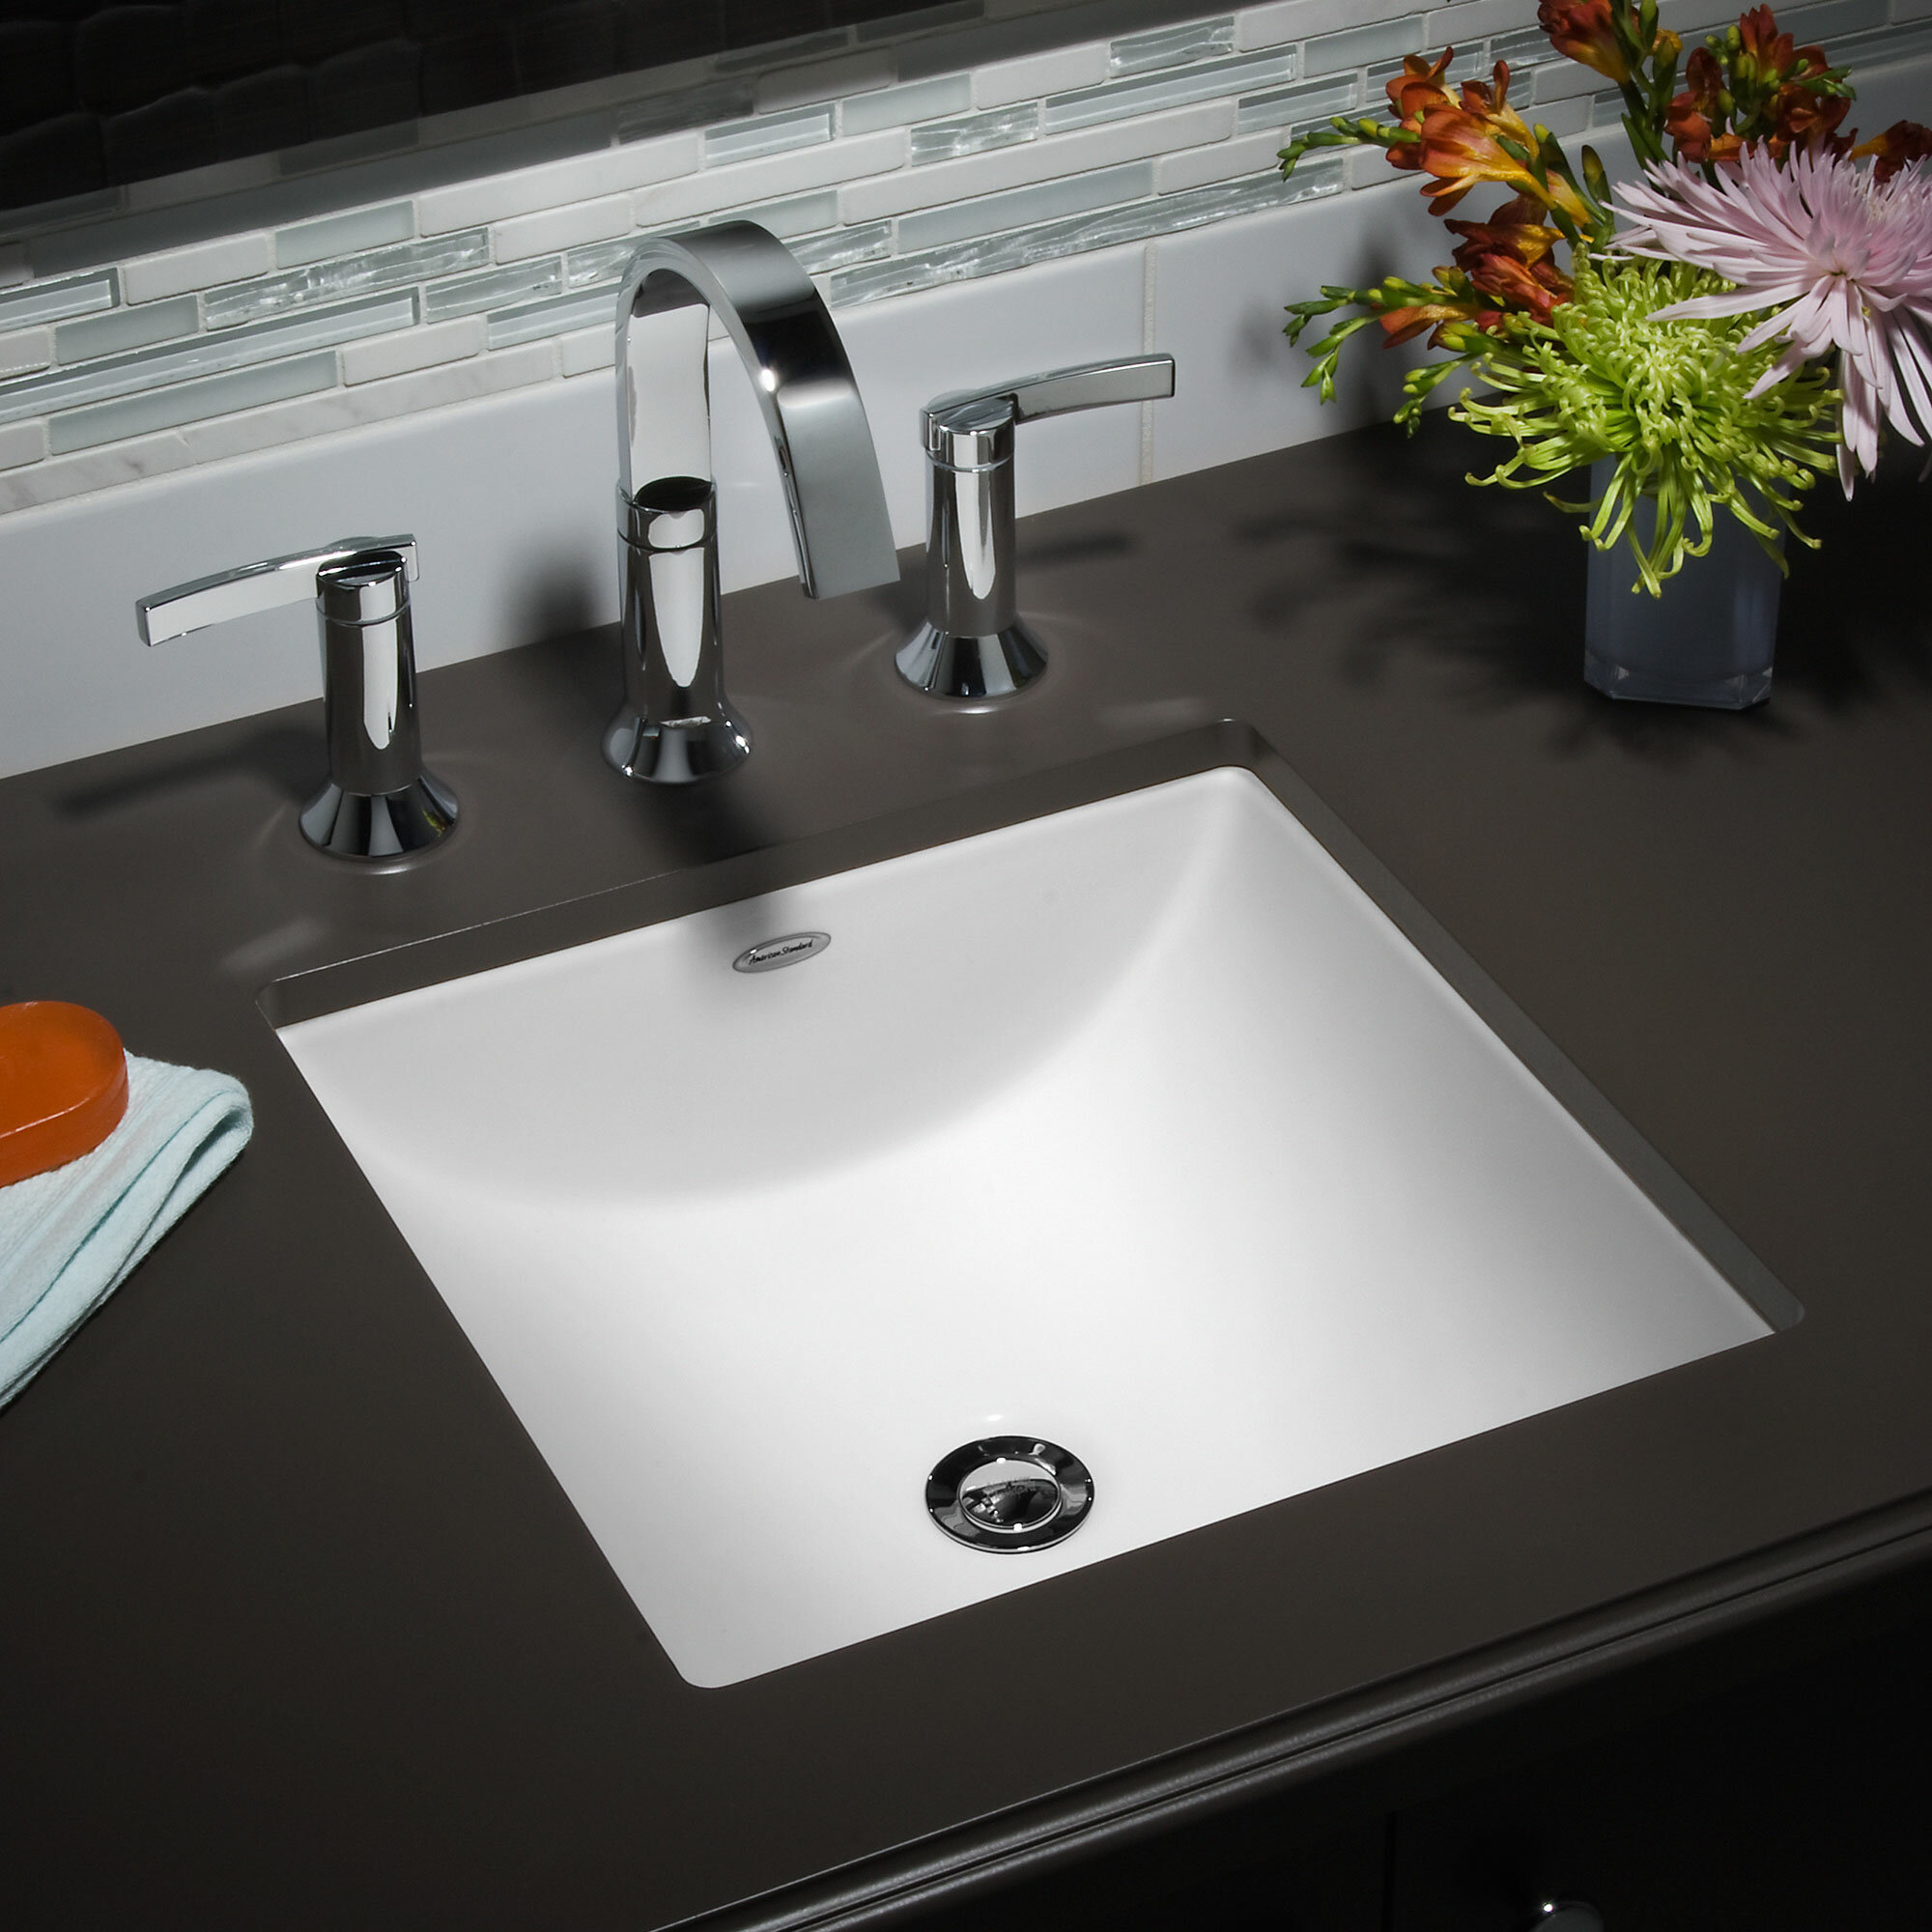 American Standard Studio Vitreous China Square Undermount Bathroom Sink With Overflow Reviews Wayfair